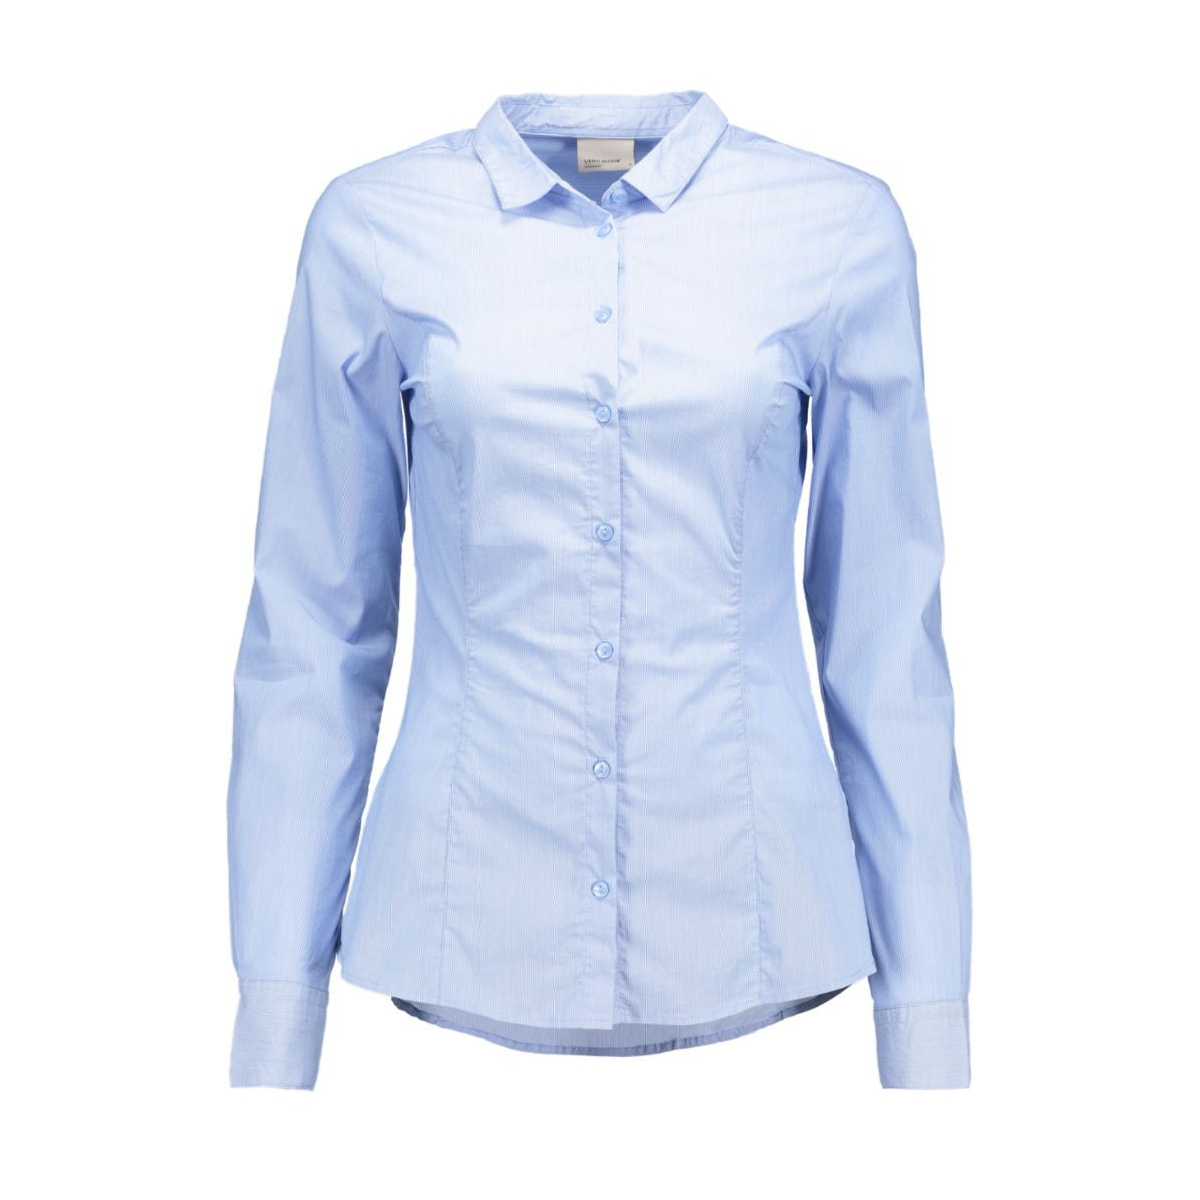 vmlady l/s shirt 10145524 vero moda blouse grapemist/pinstripe